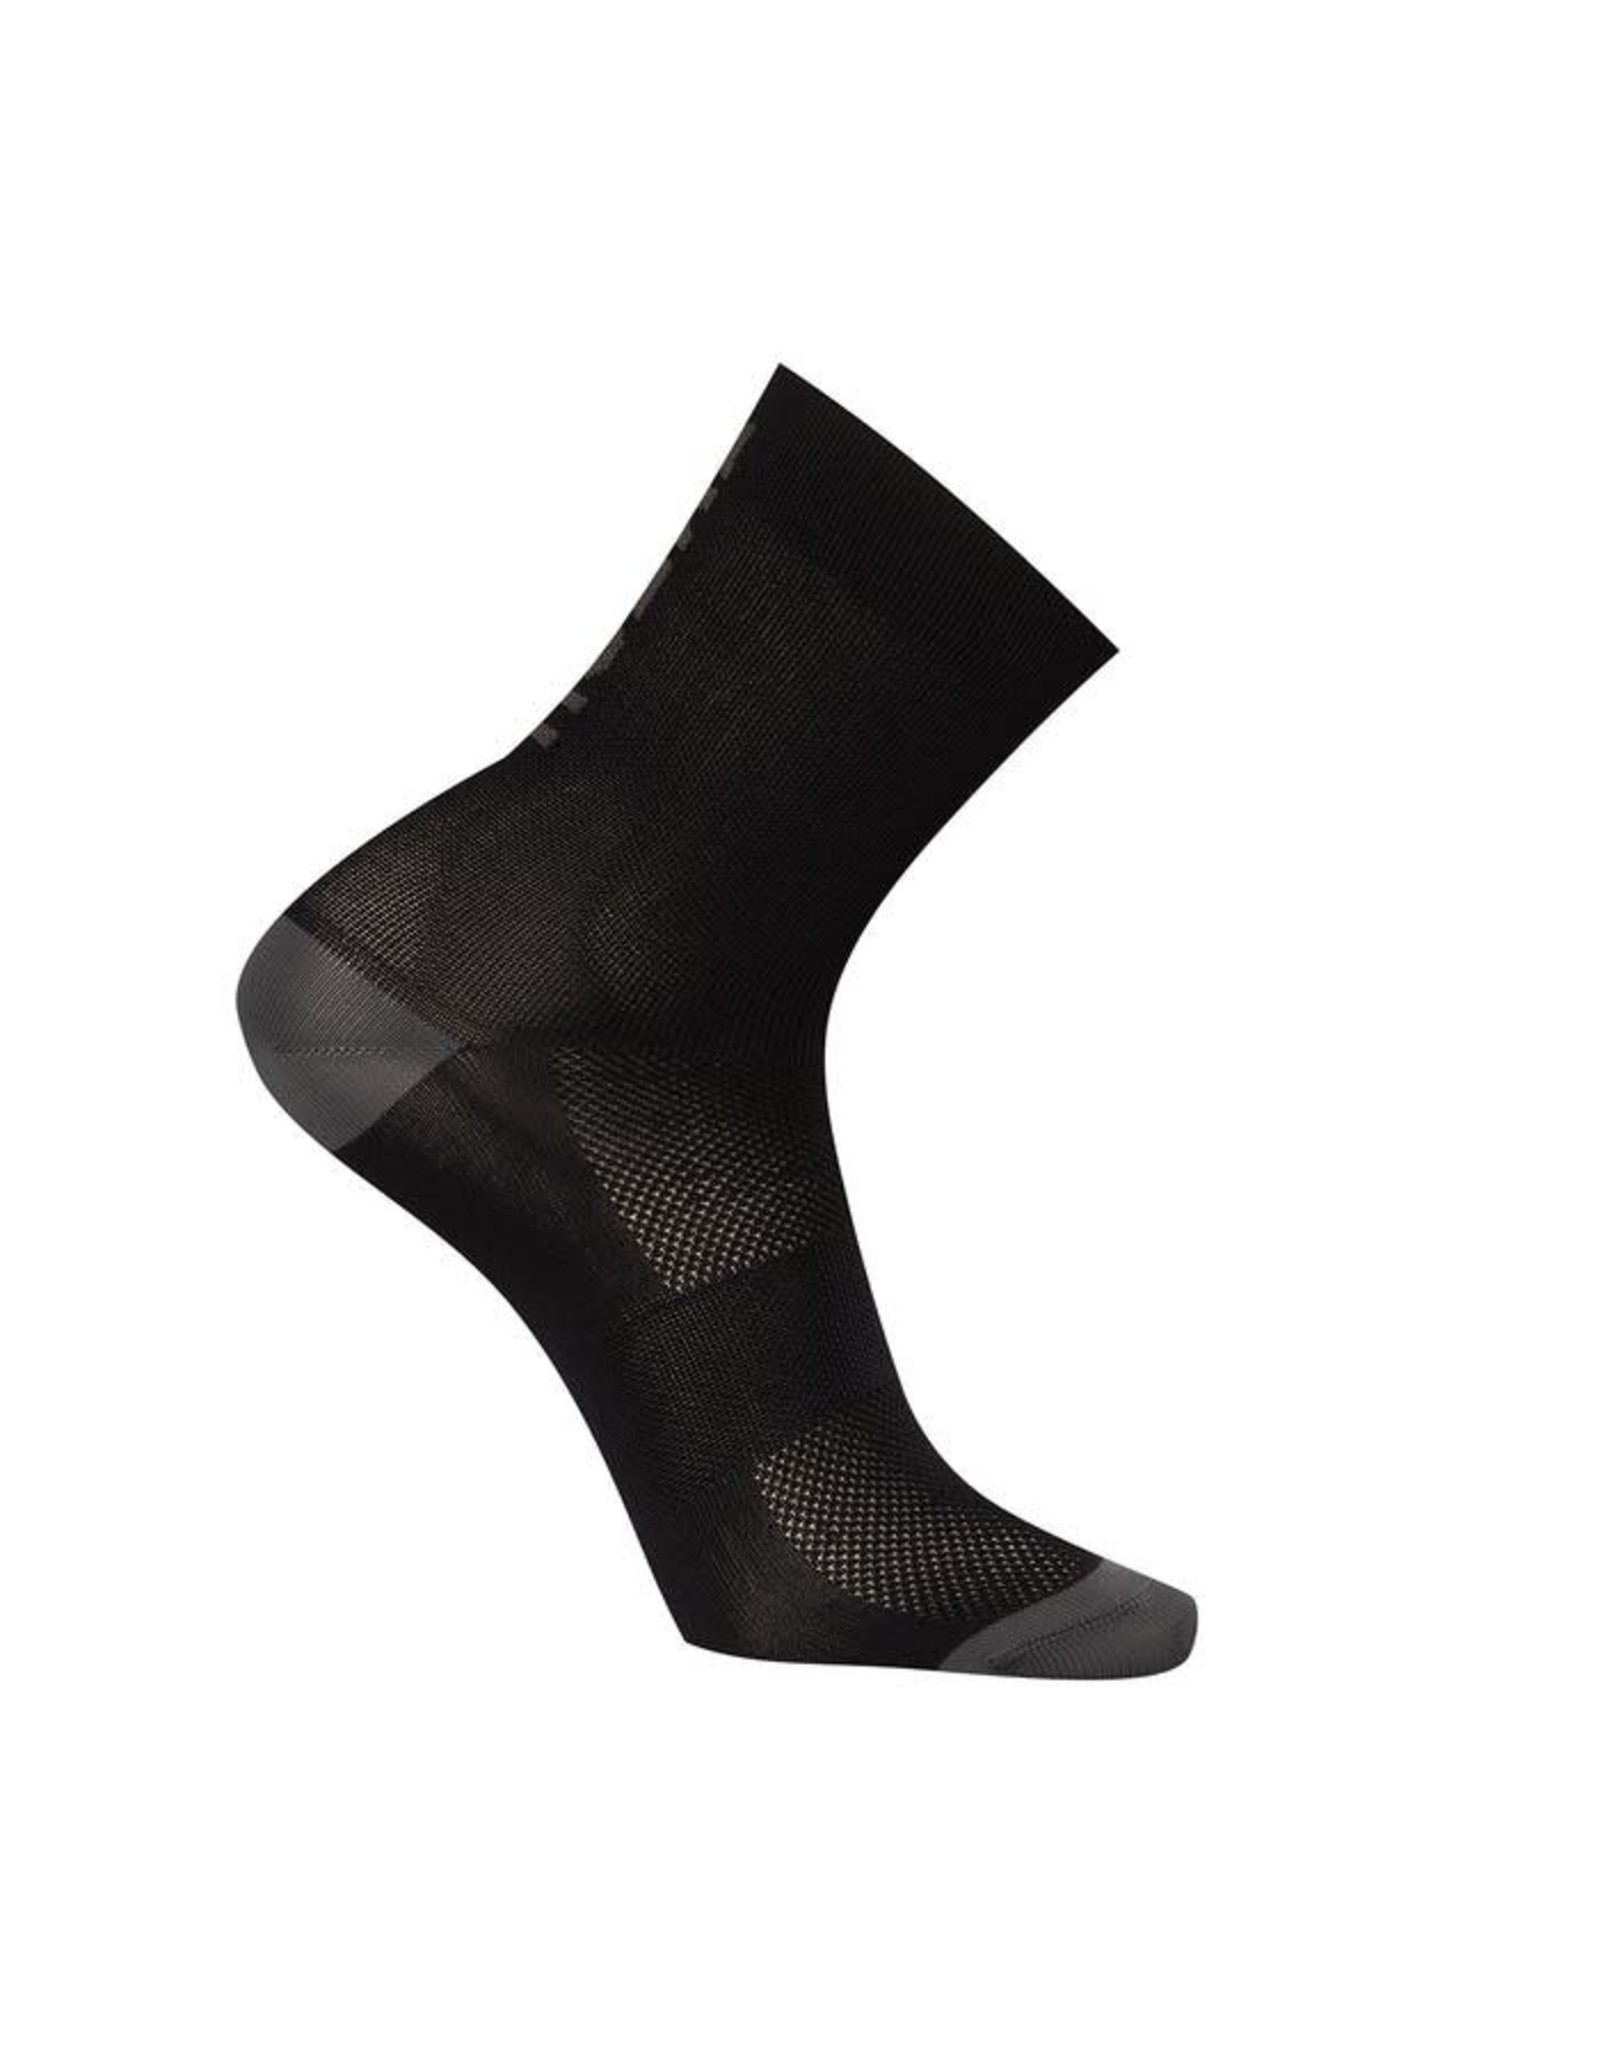 7MESH 7MESH - Word Sock Black Small